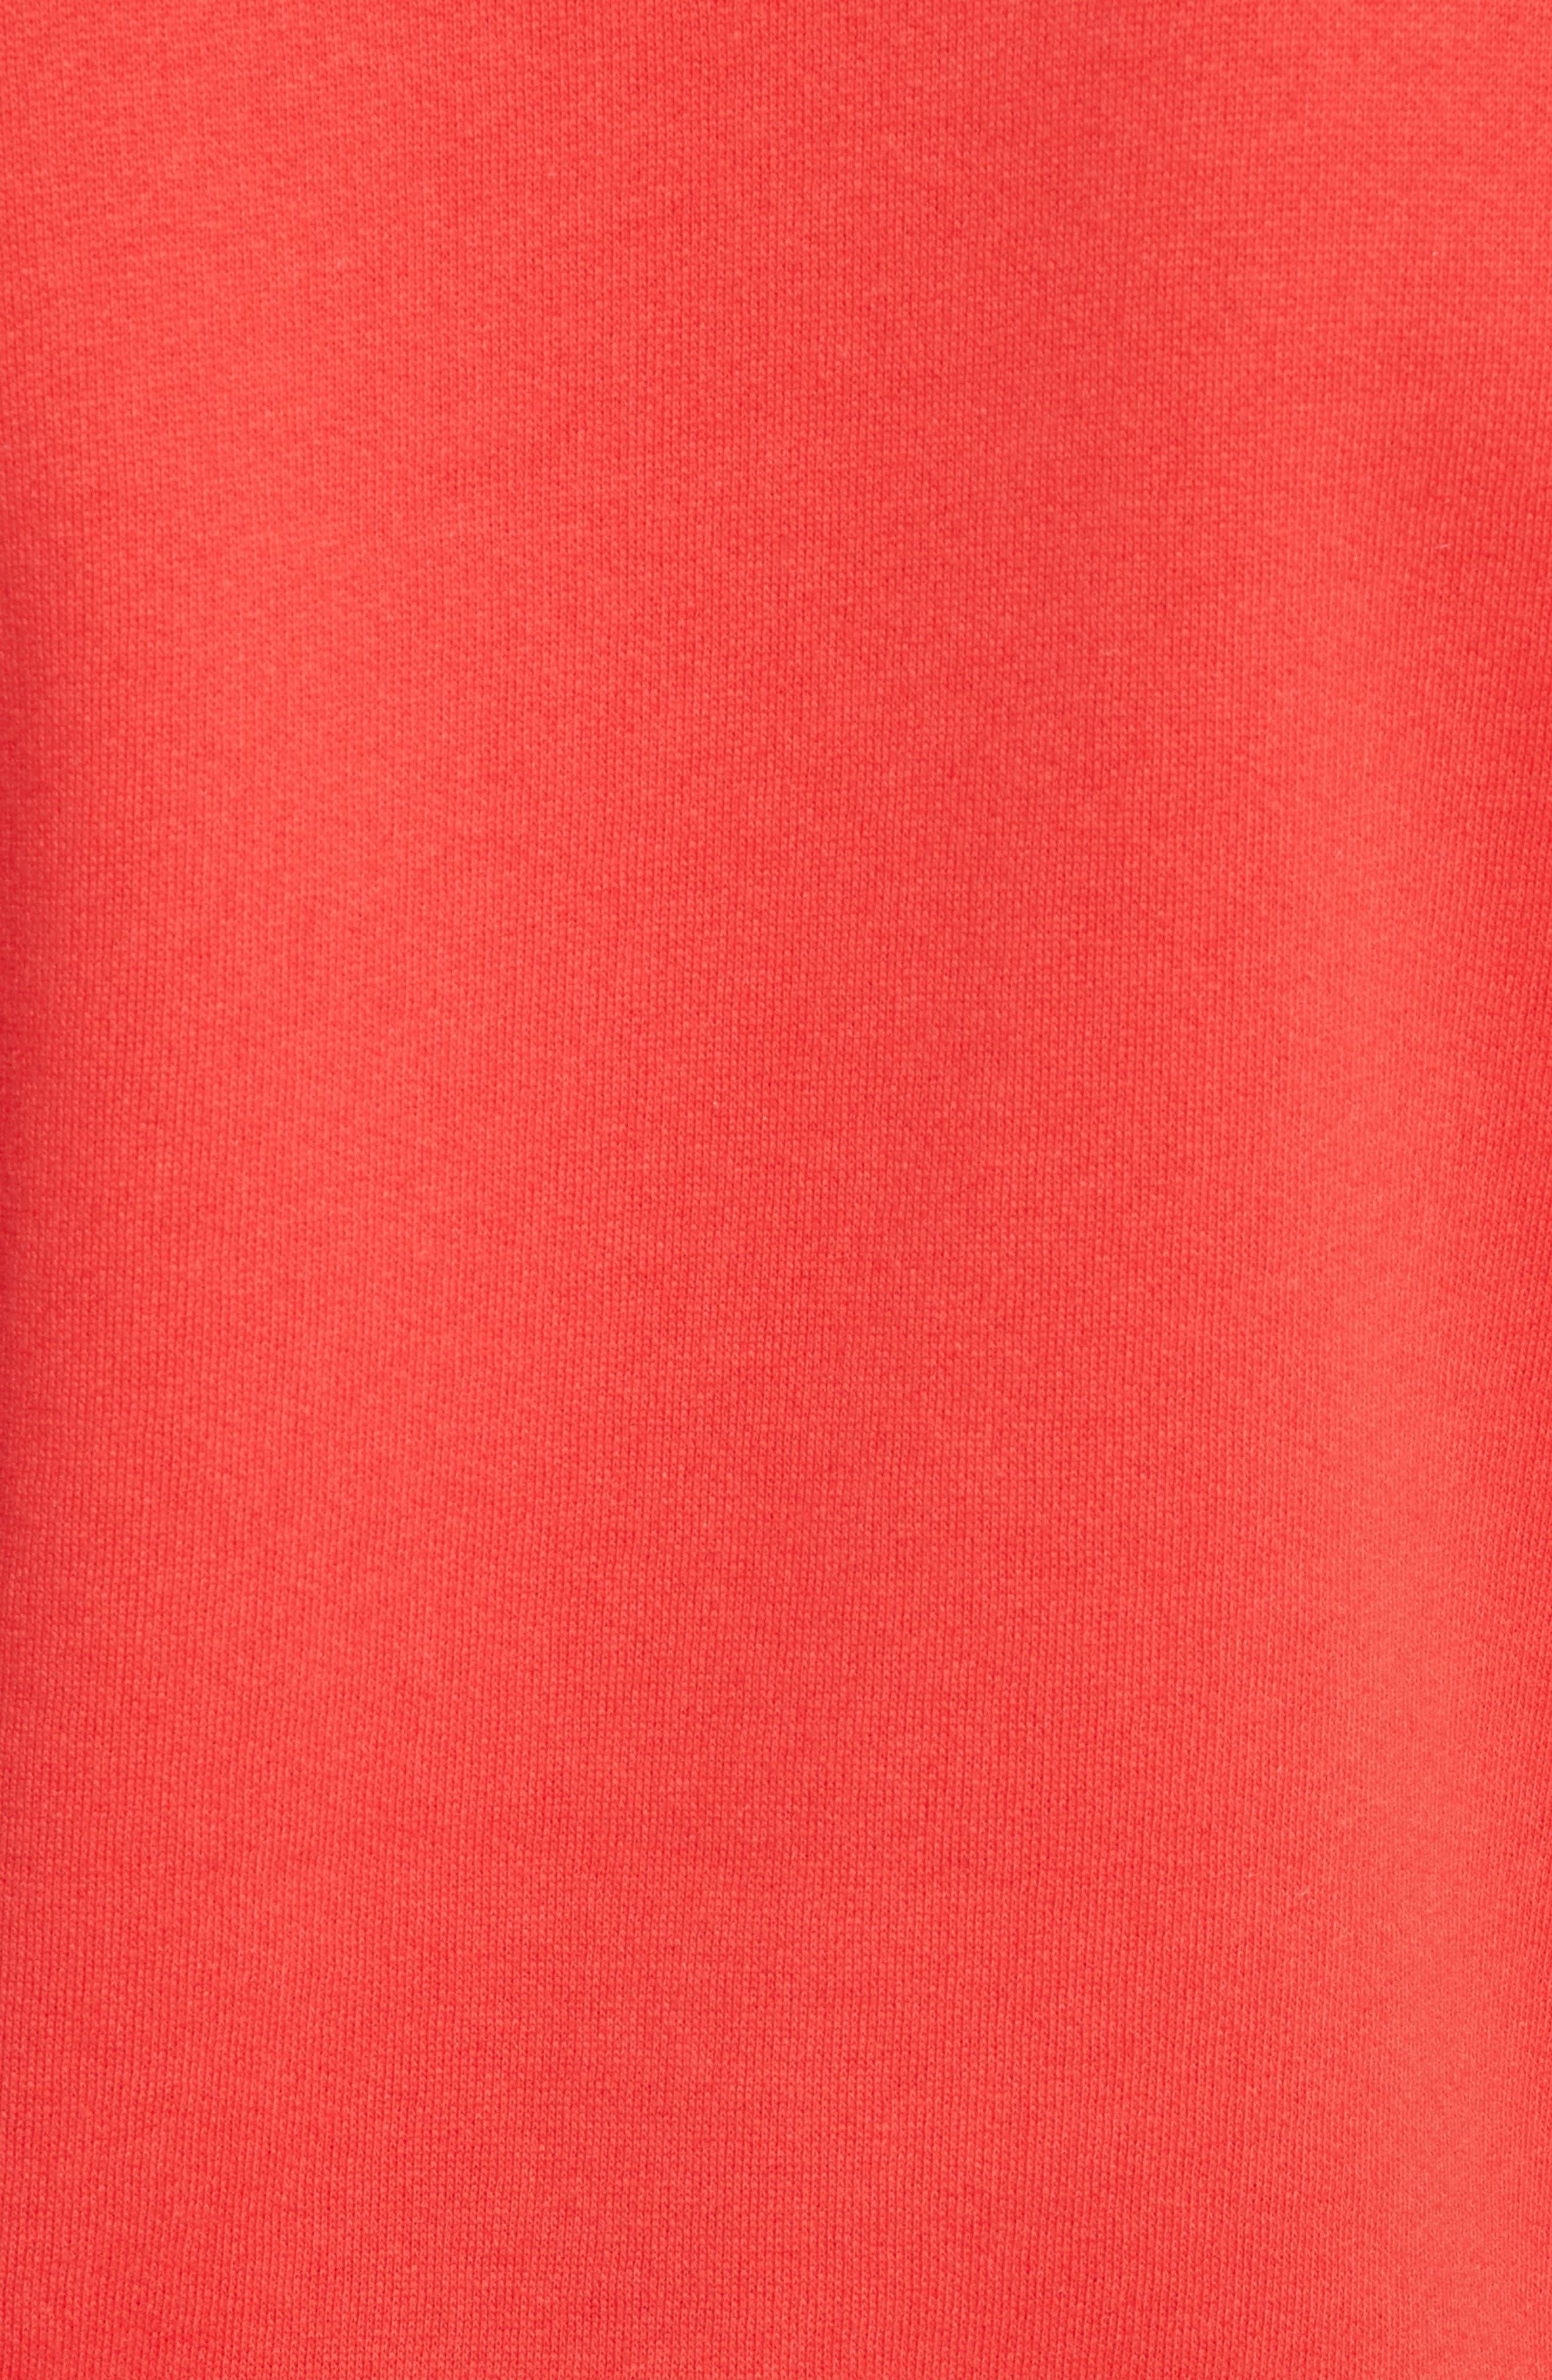 Alternate Image 5  - Opening Ceremony Elastic Logo Crop Sweatshirt (Limited Edition)